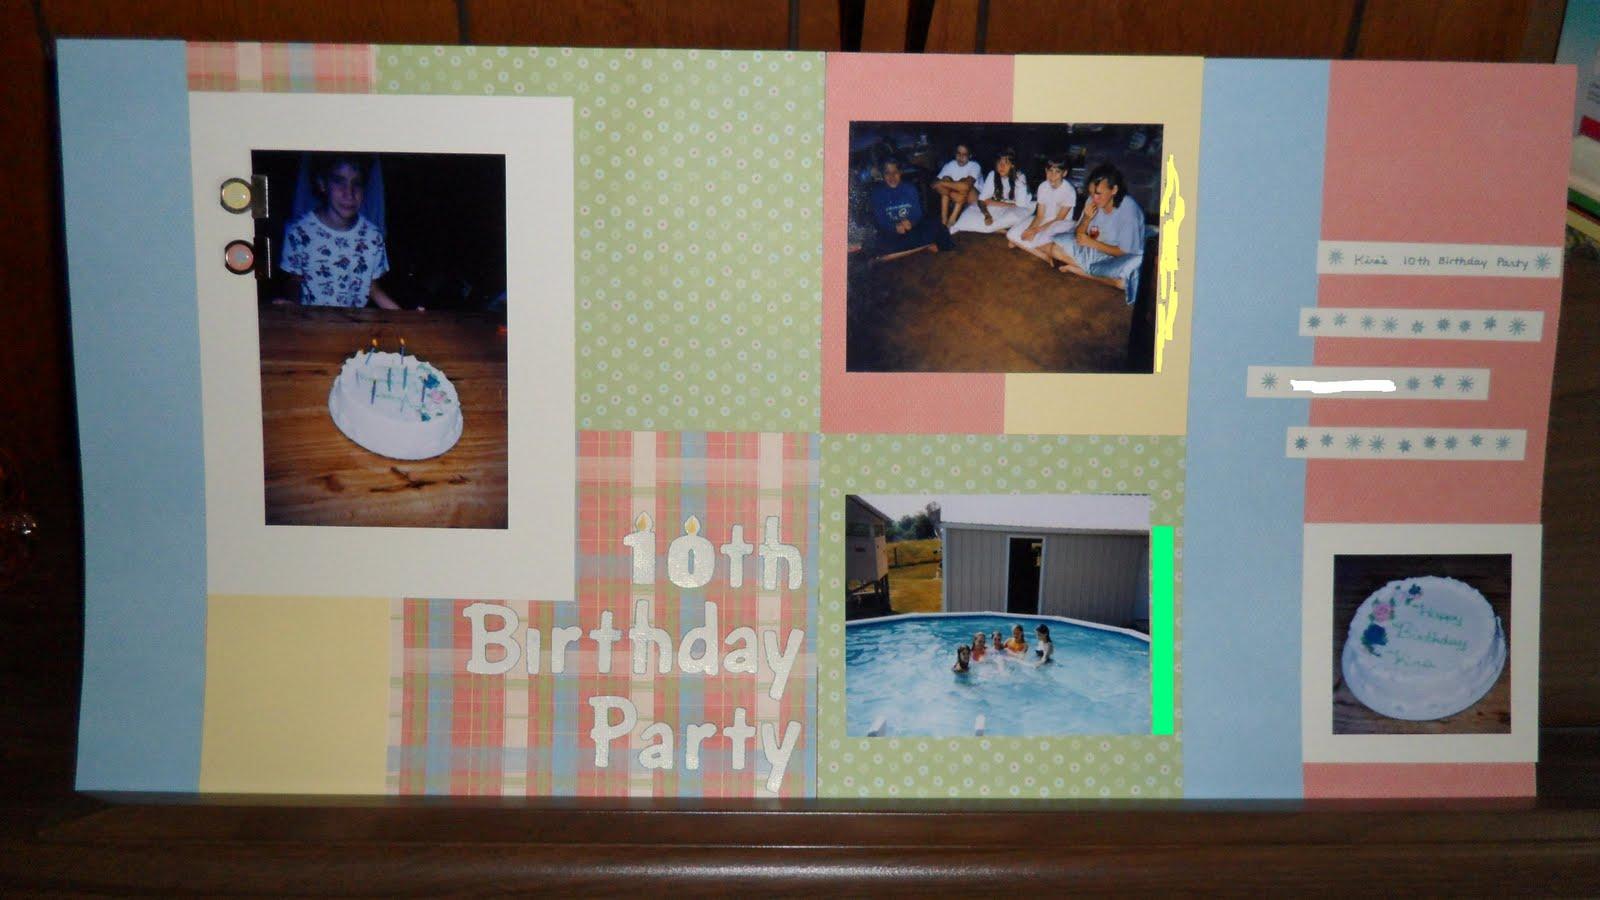 http://3.bp.blogspot.com/_zWBV8fKqGCw/TBVTIG73SrI/AAAAAAAAARo/JYguPzQqBfU/s1600/Caboodle+WOTG+Layout-+Birthday+Party.JPG